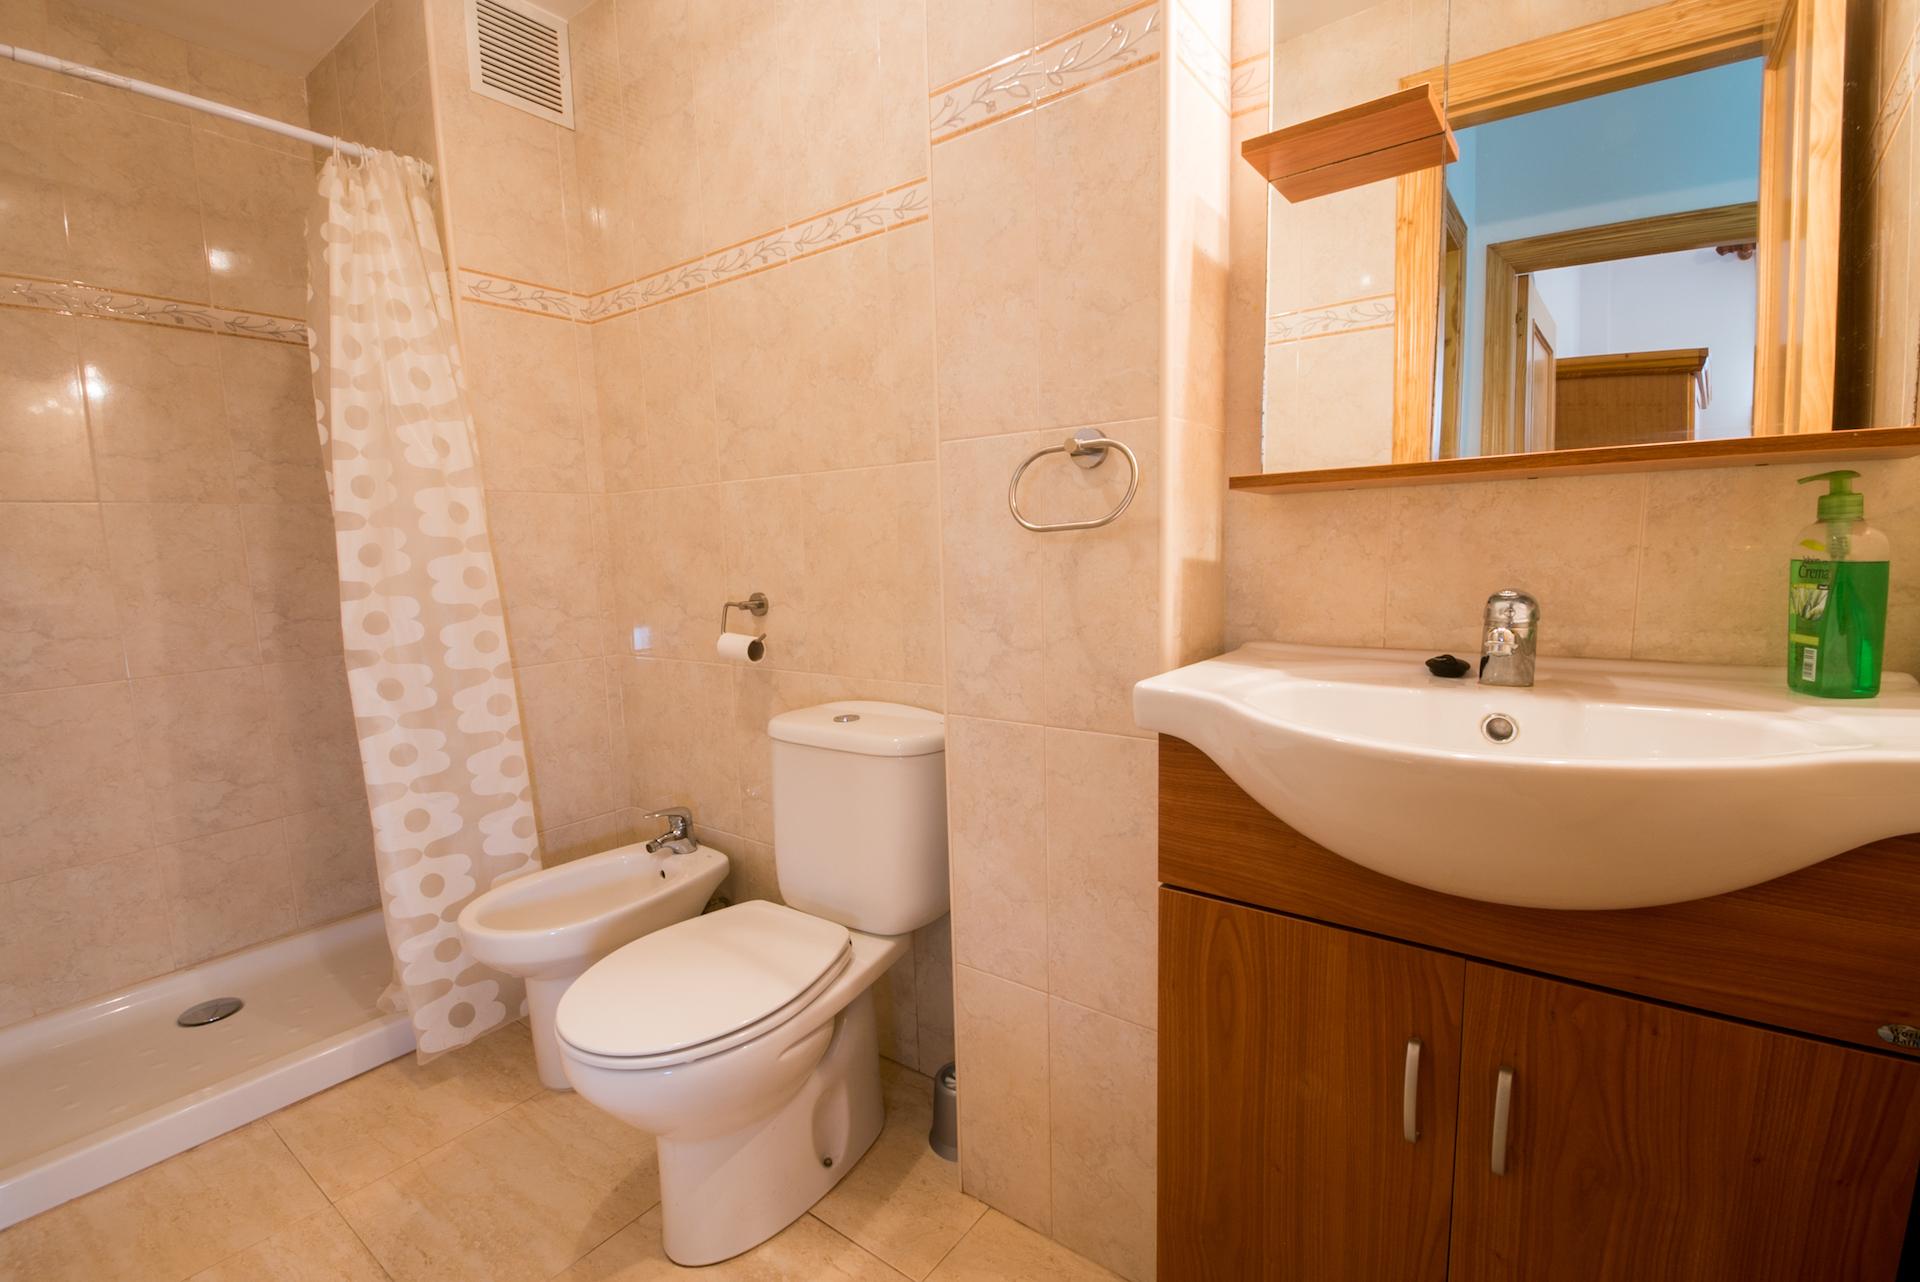 Apartamento Benafer 2 - Cuarto de Baño